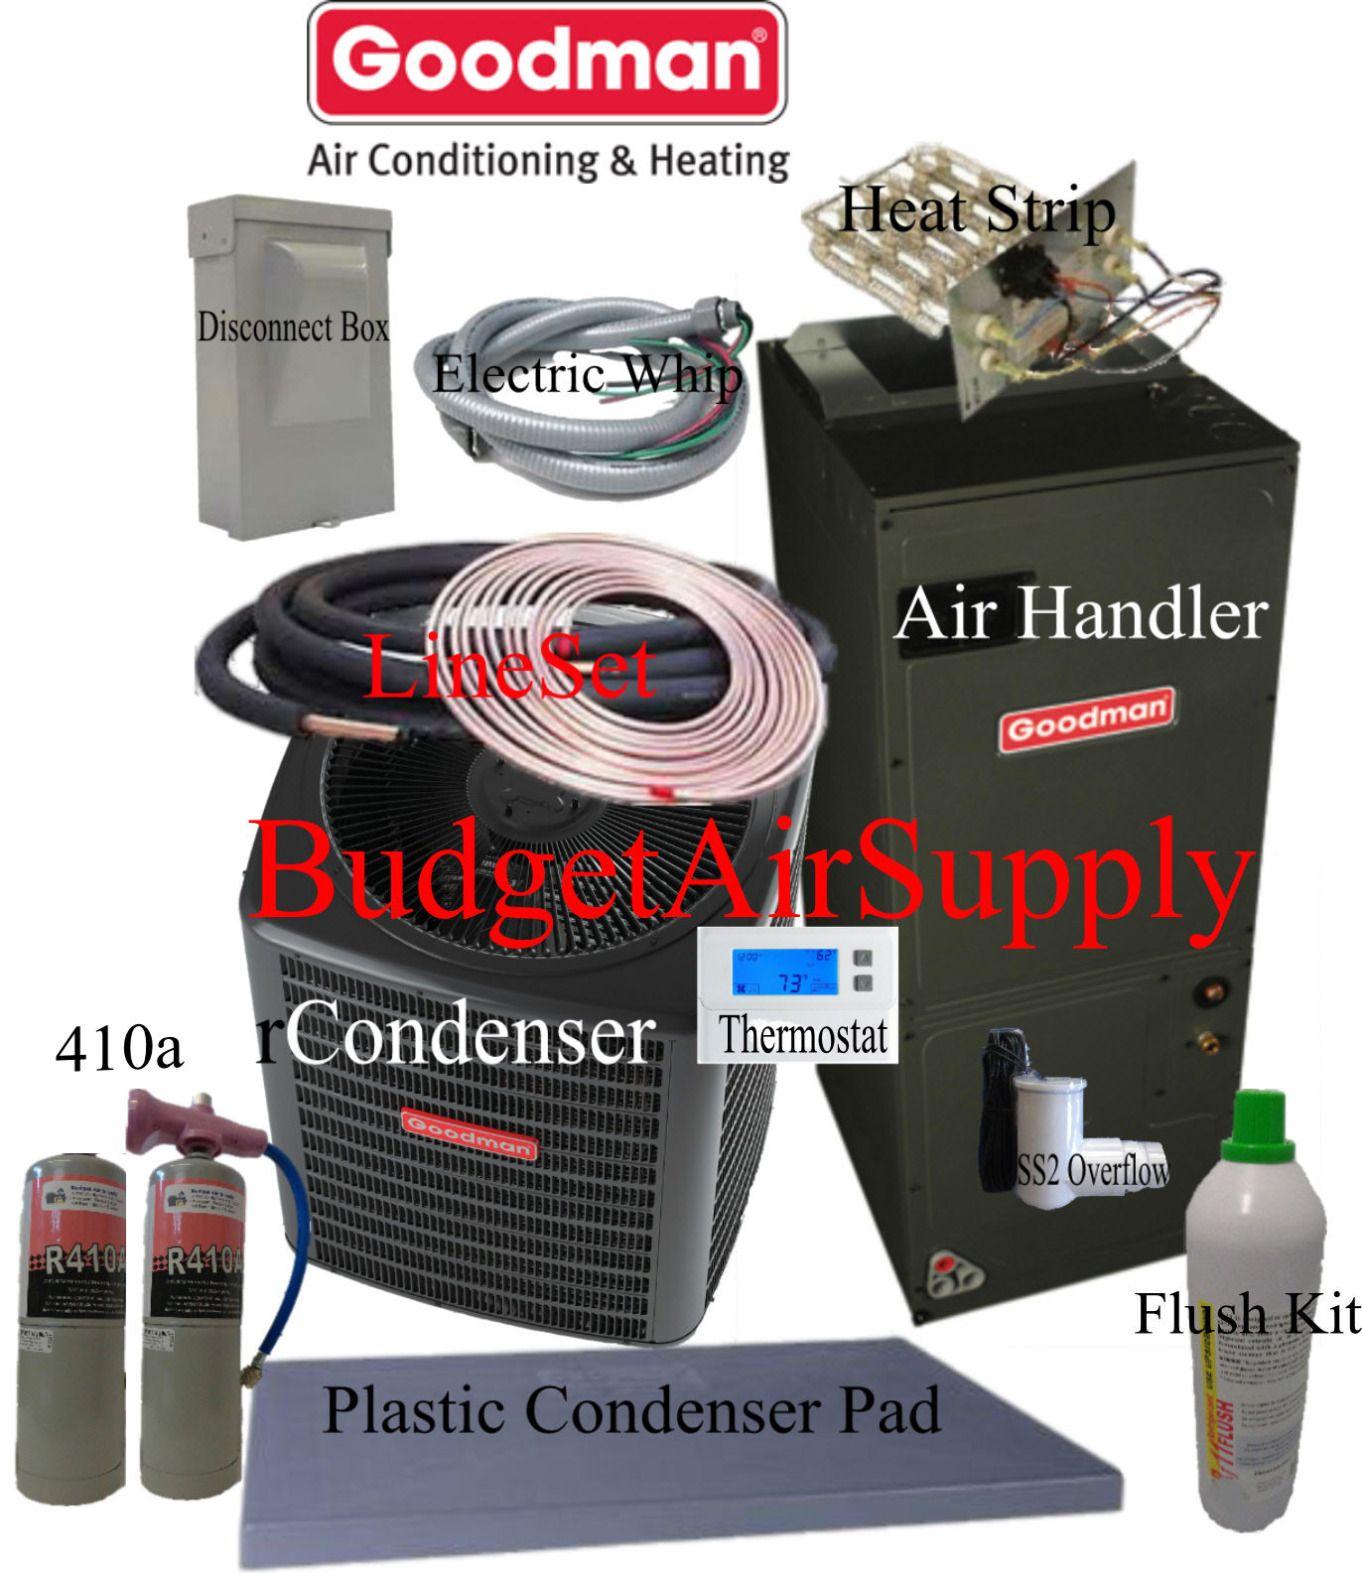 3 Ton Heat Pump in 2020 Heat pump, Split system, Heat